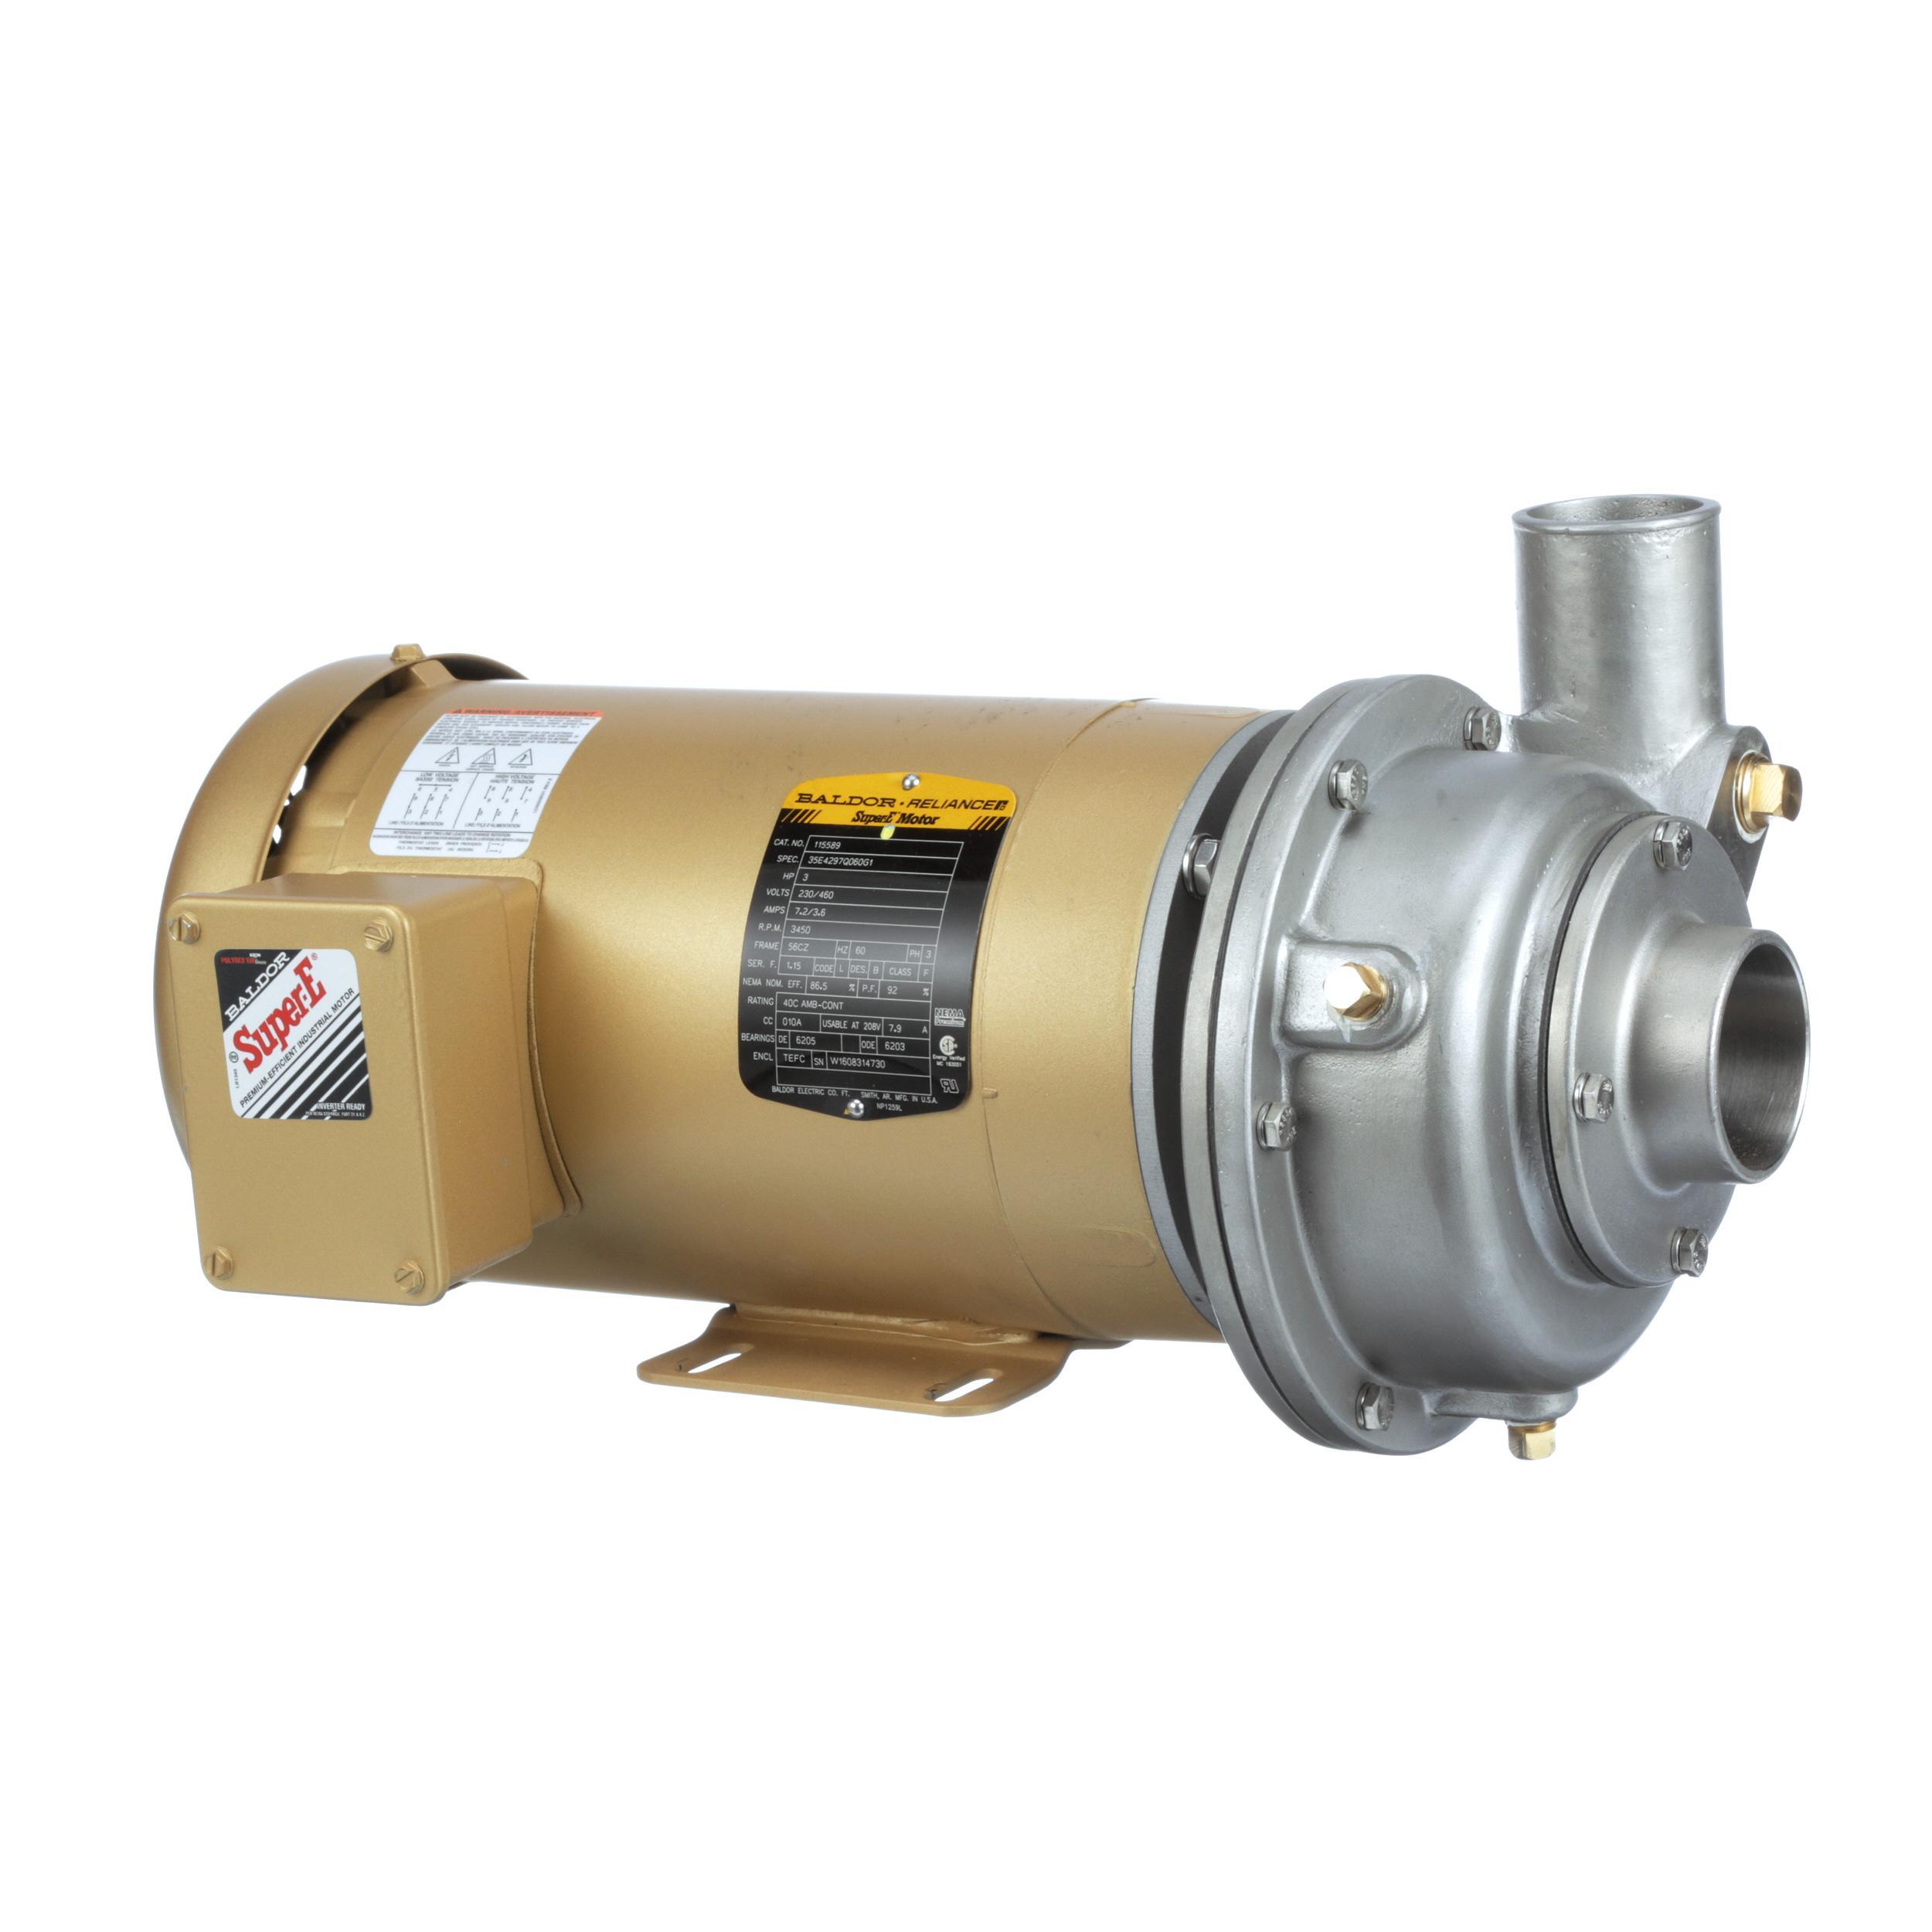 Champion Pump And Motor Assy Part 405923